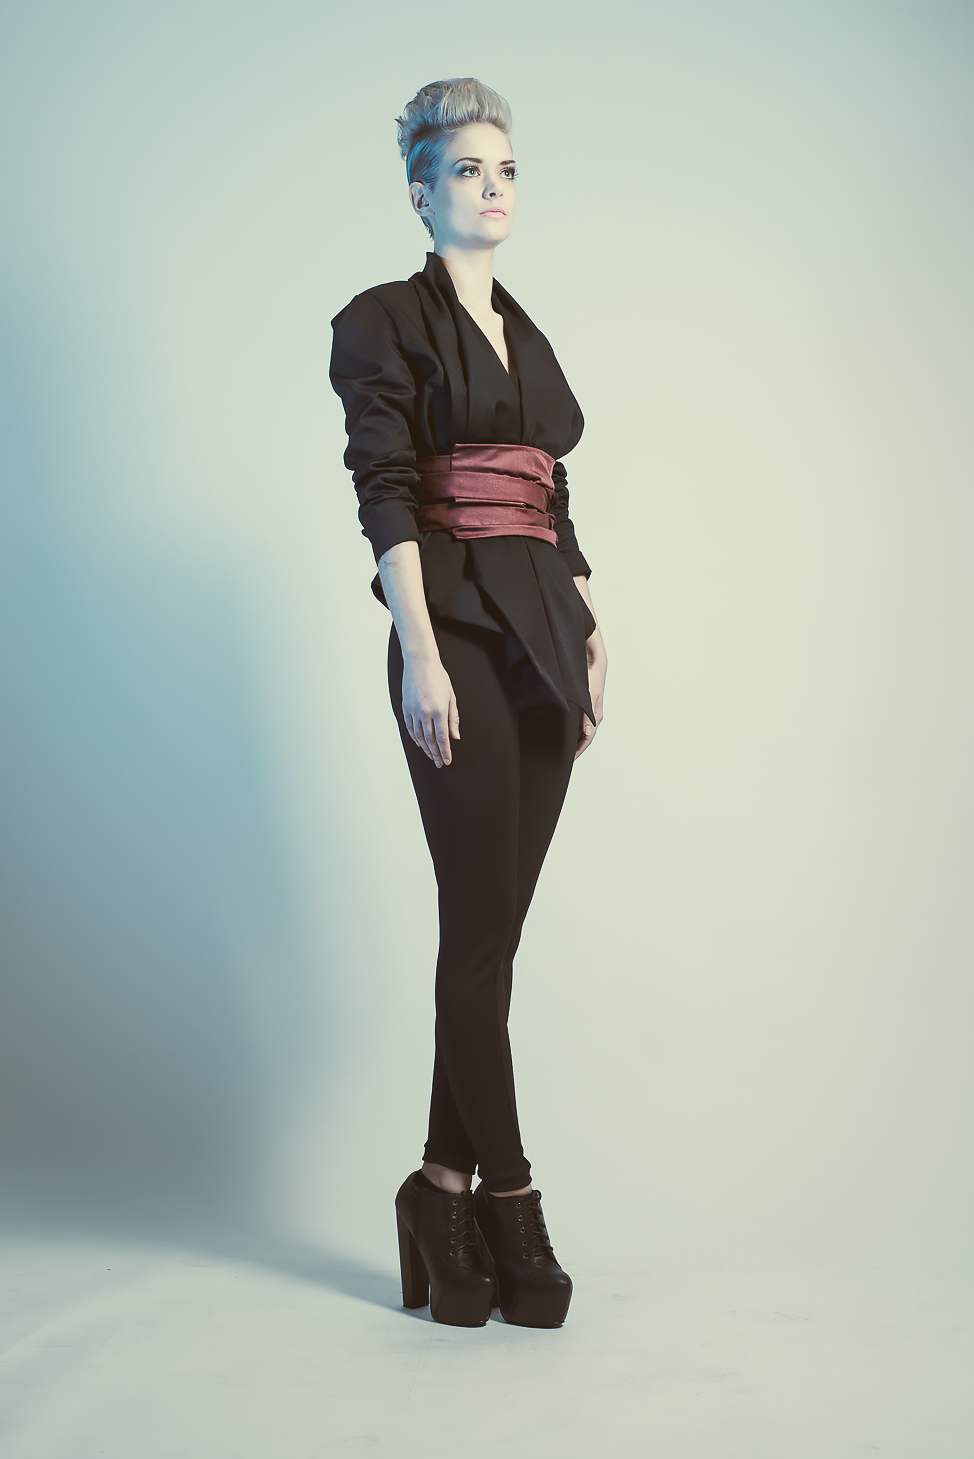 zaramia-ava-zaramiaava-leeds-fashion-designer-ethical-sustainable-tailored-minimalist-mio-black-jacket-top-red-belt-versatile-drape-cowl-styling-menswear-models-photoshoot-shrine-hairdressers-41